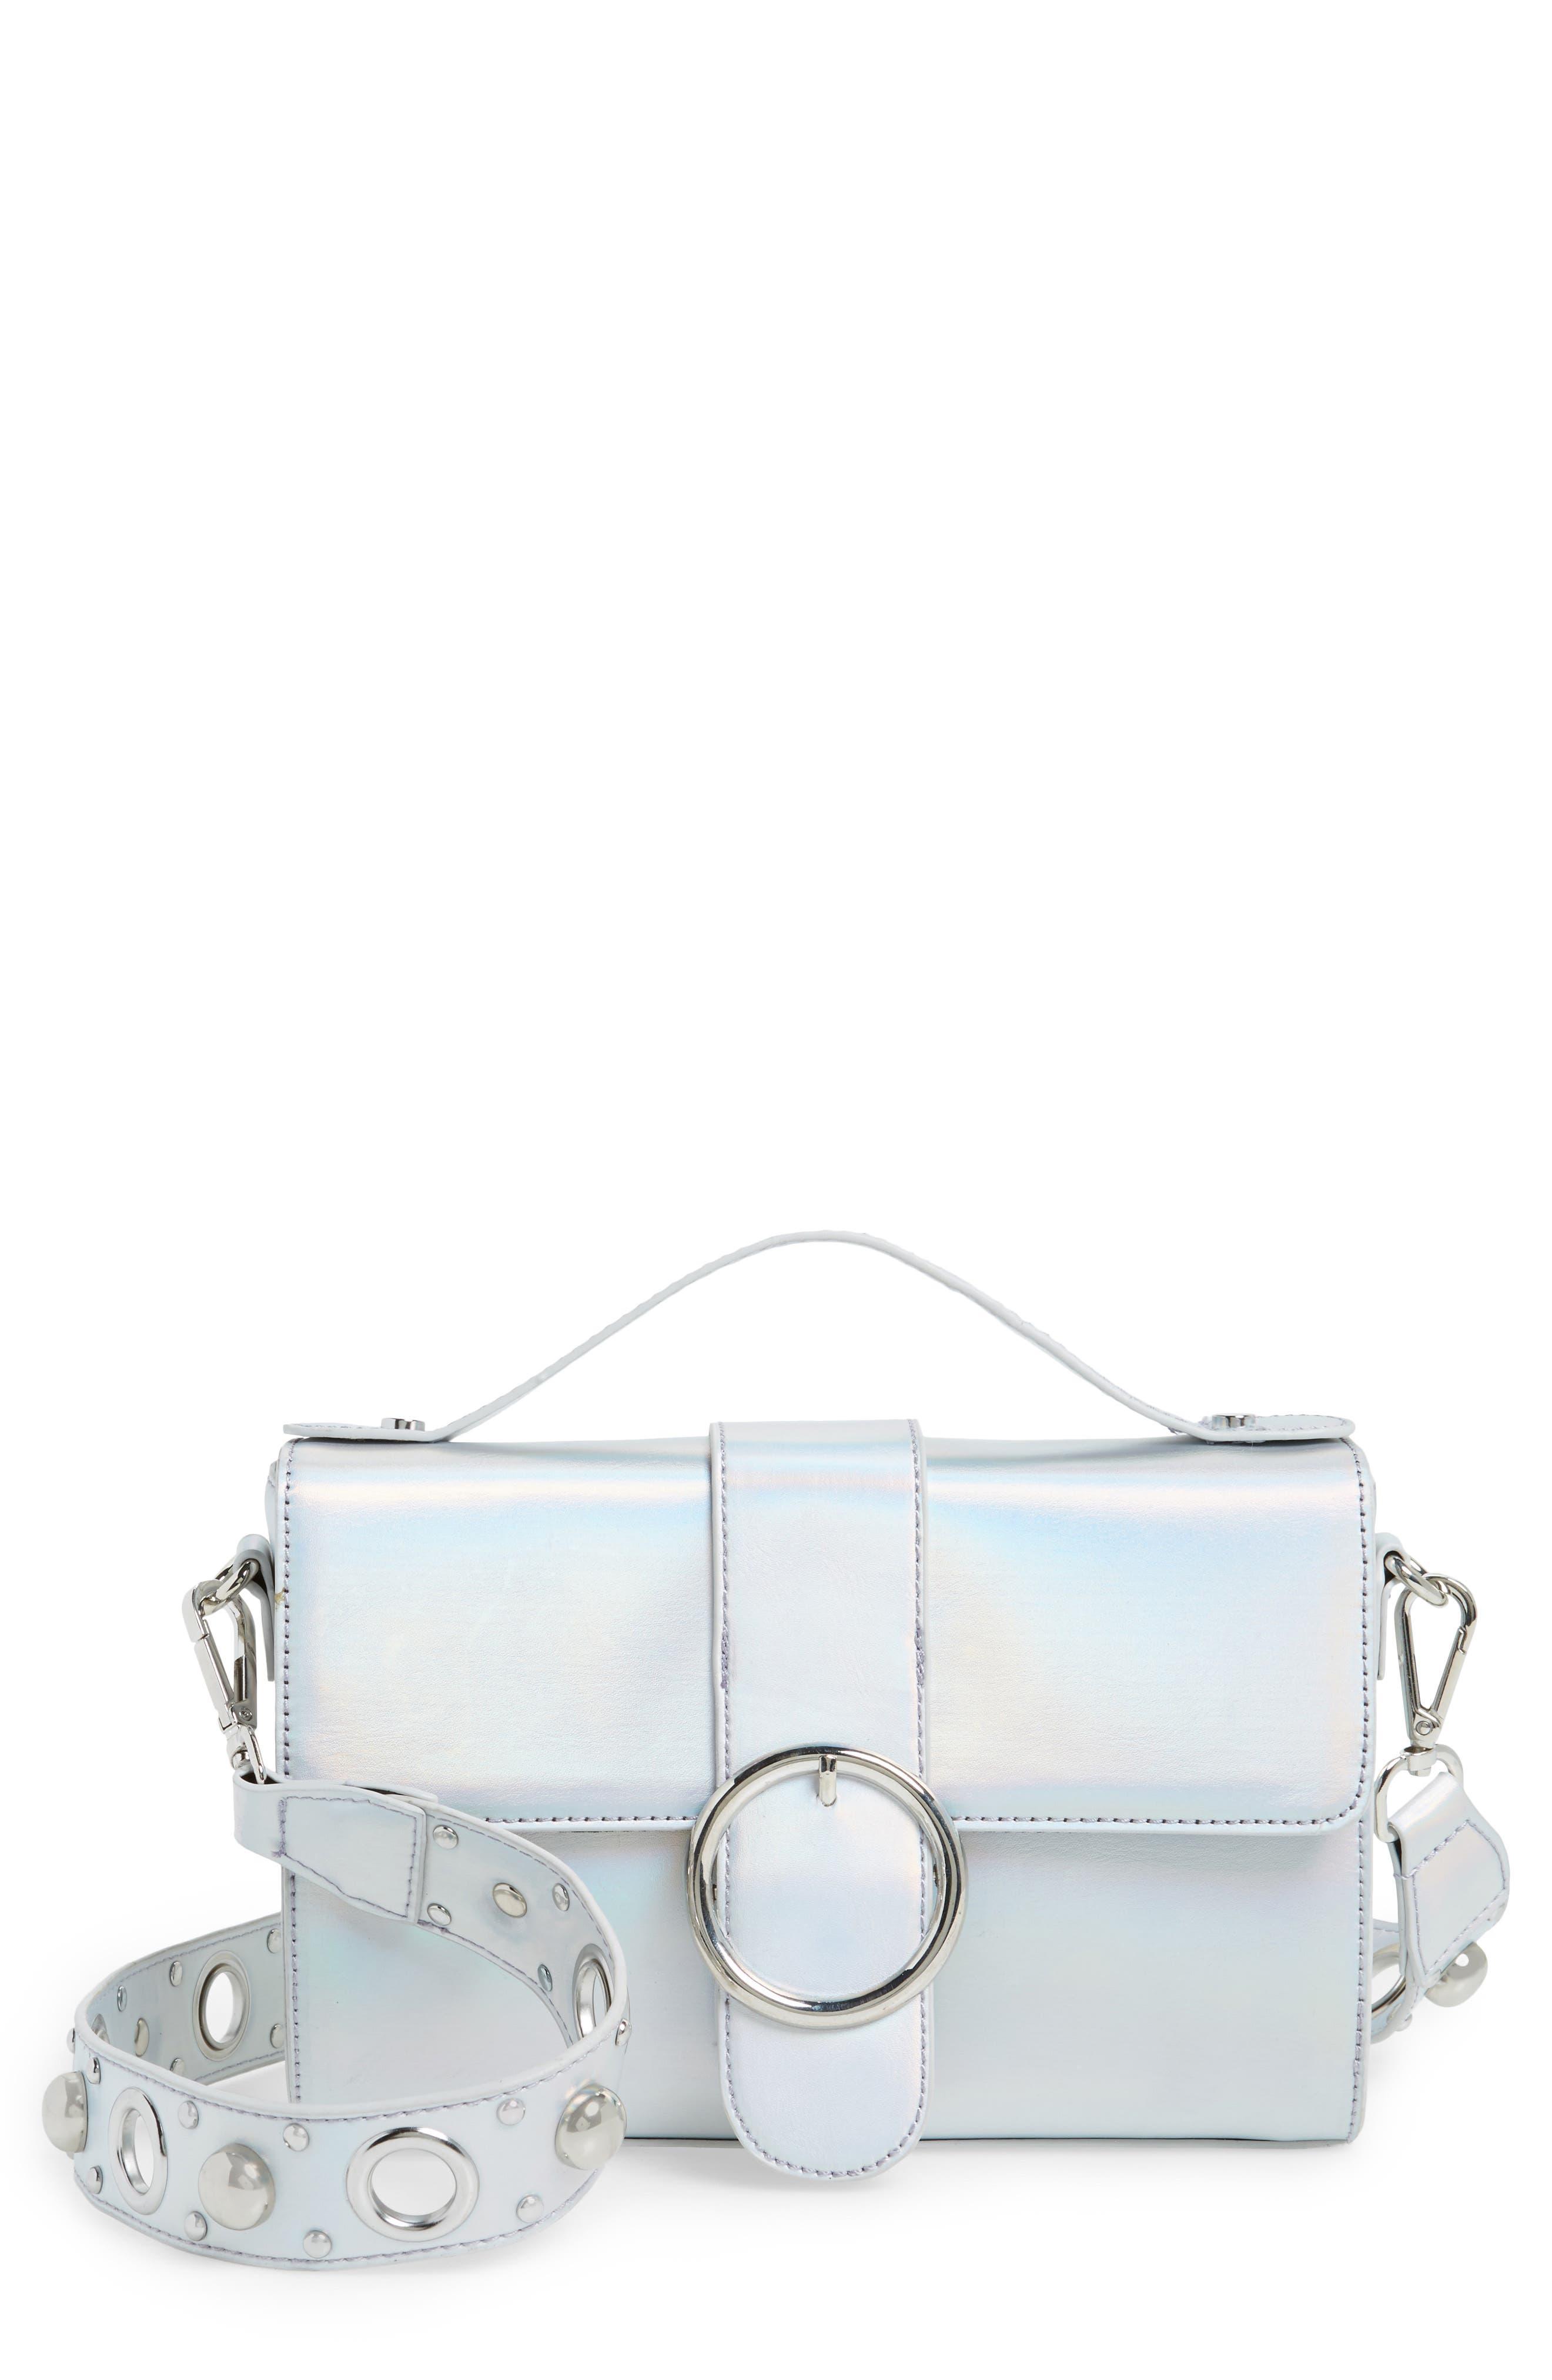 Studded Strap Crossbody Bag,                             Main thumbnail 1, color,                             040